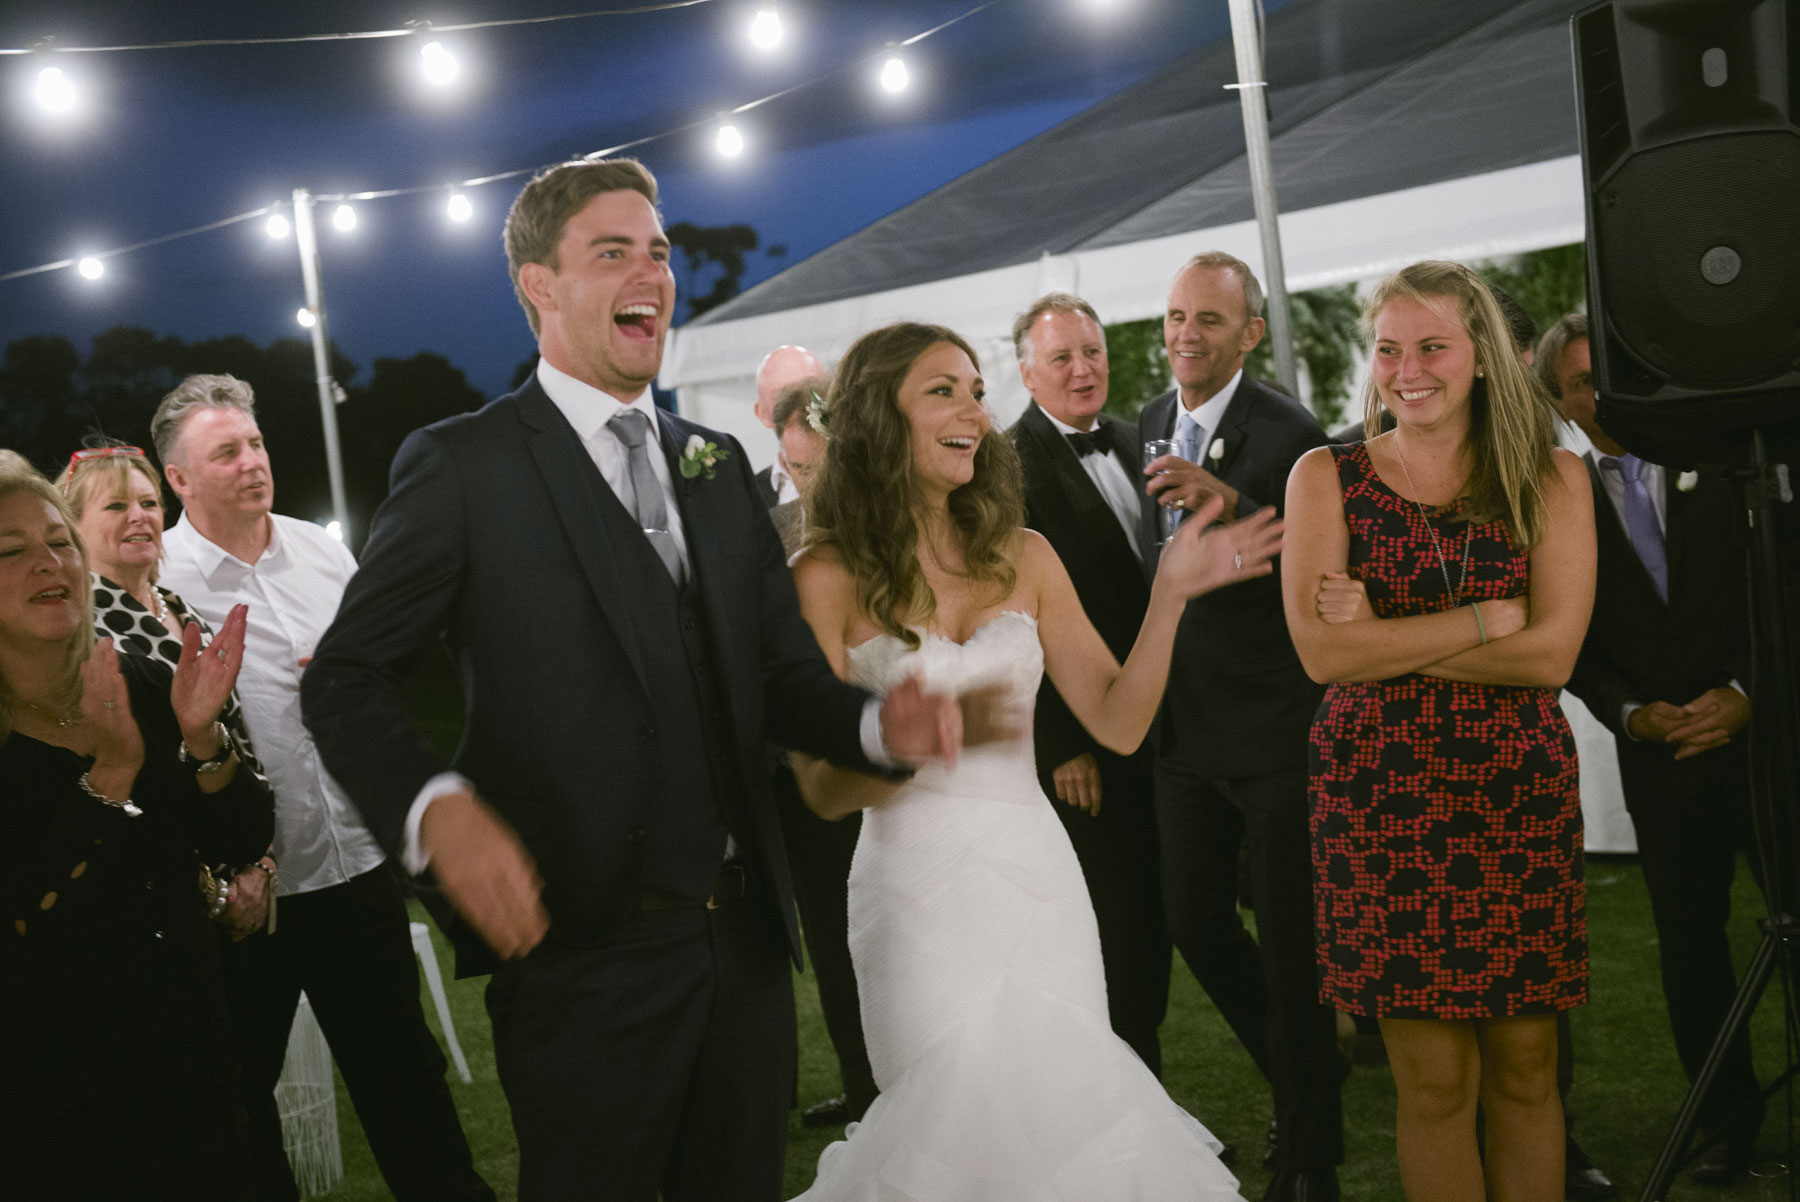 1501vand-433alan_moyle_wedding_portrait_brighton_bayside_werribee_estate_mansion_zoo_rustic_styled_garden_mansion_candid_documentry_victoria_whitelaw.jpg